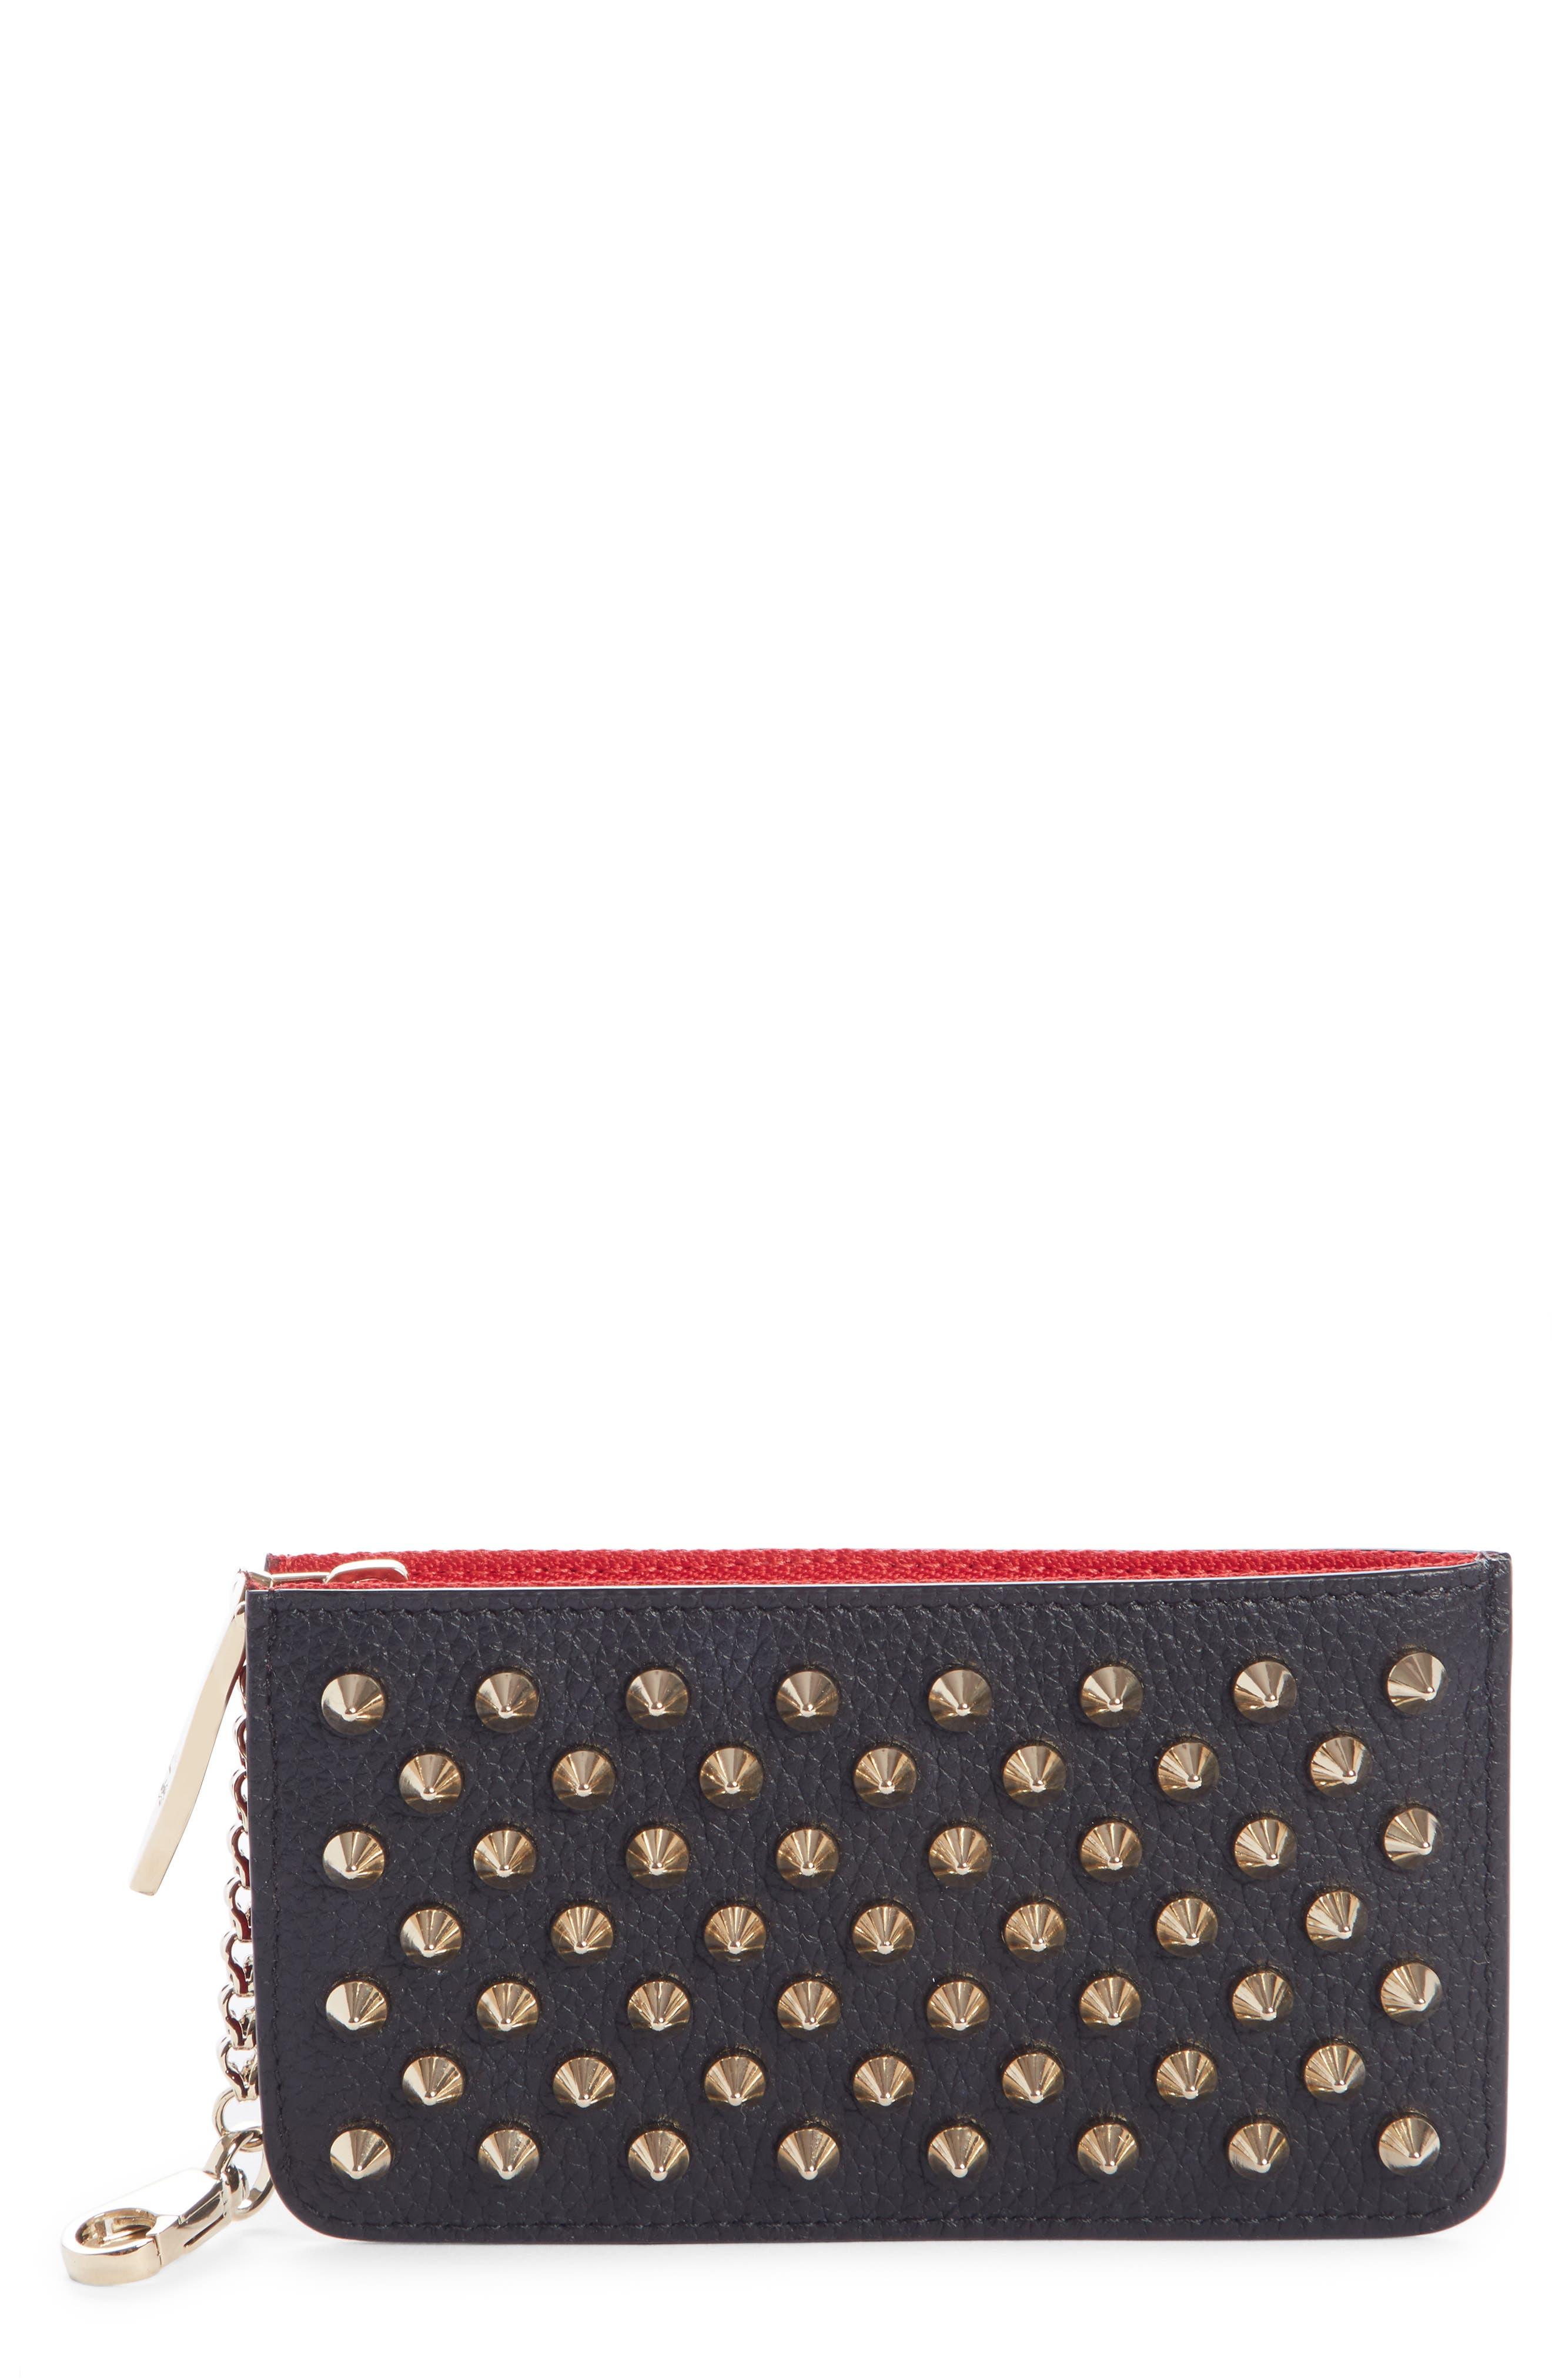 CHRISTIAN LOUBOUTIN Credilou Calfskin Leather Zip Card Case, Main, color, BLACK/ GOLD